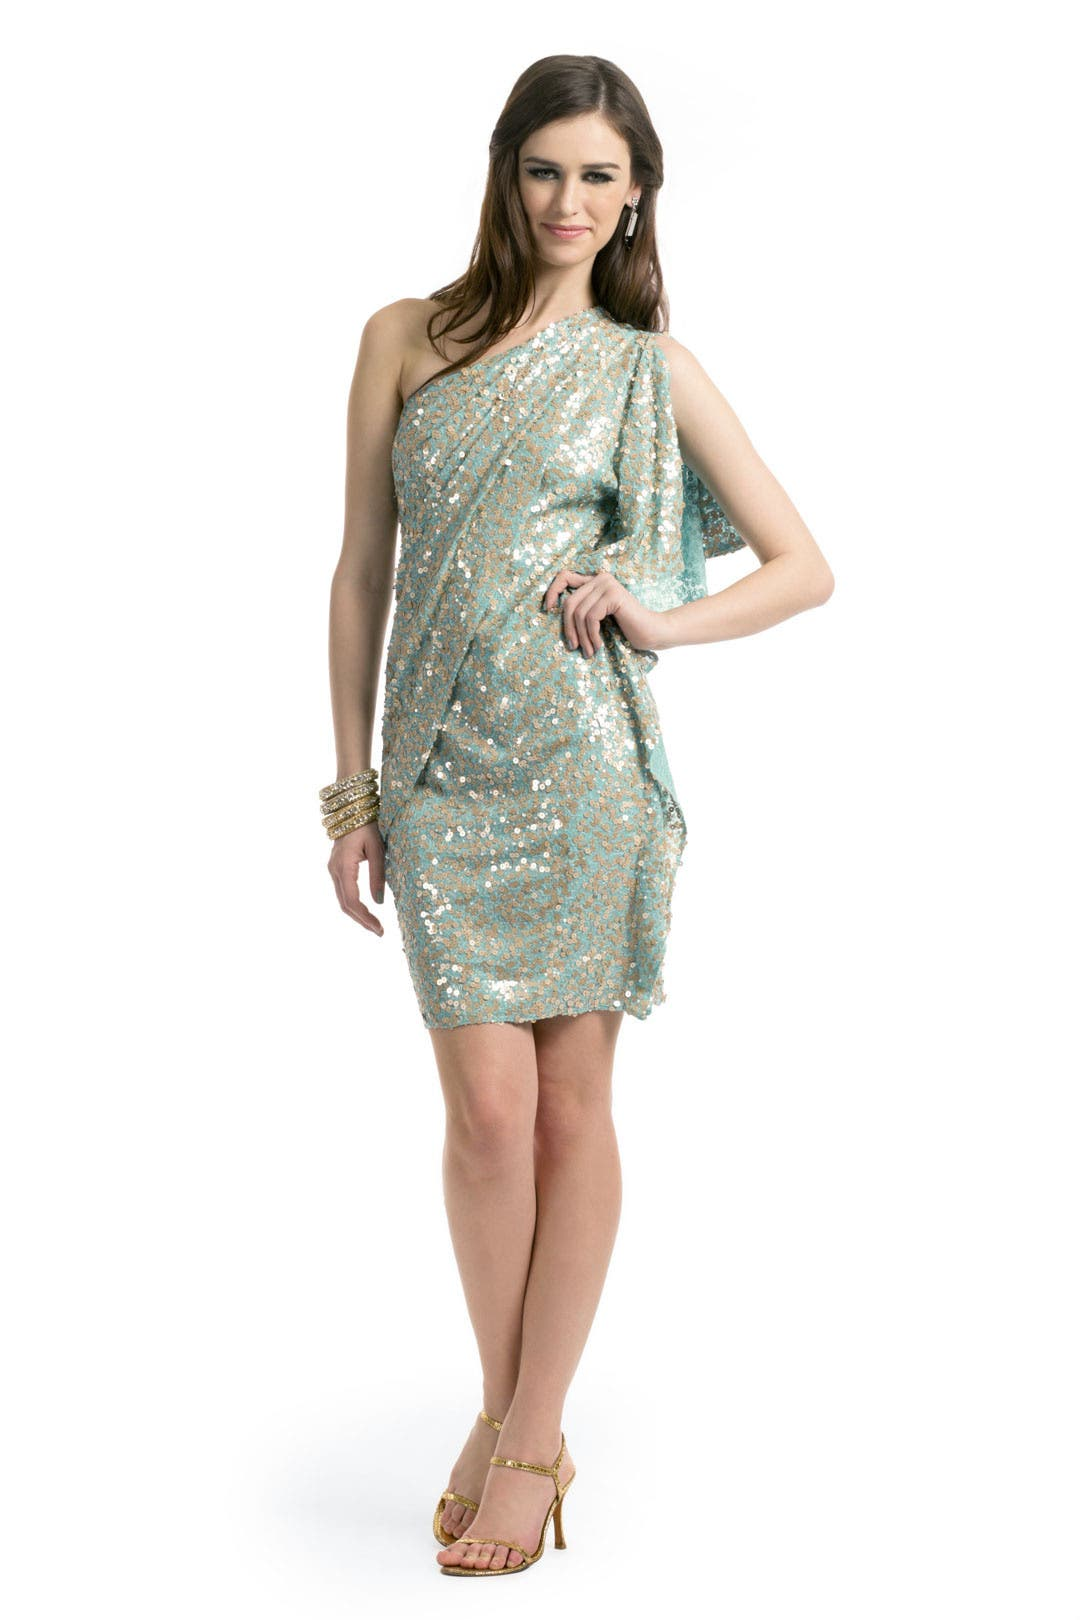 Aqua Wonder Dress by Badgley Mischka